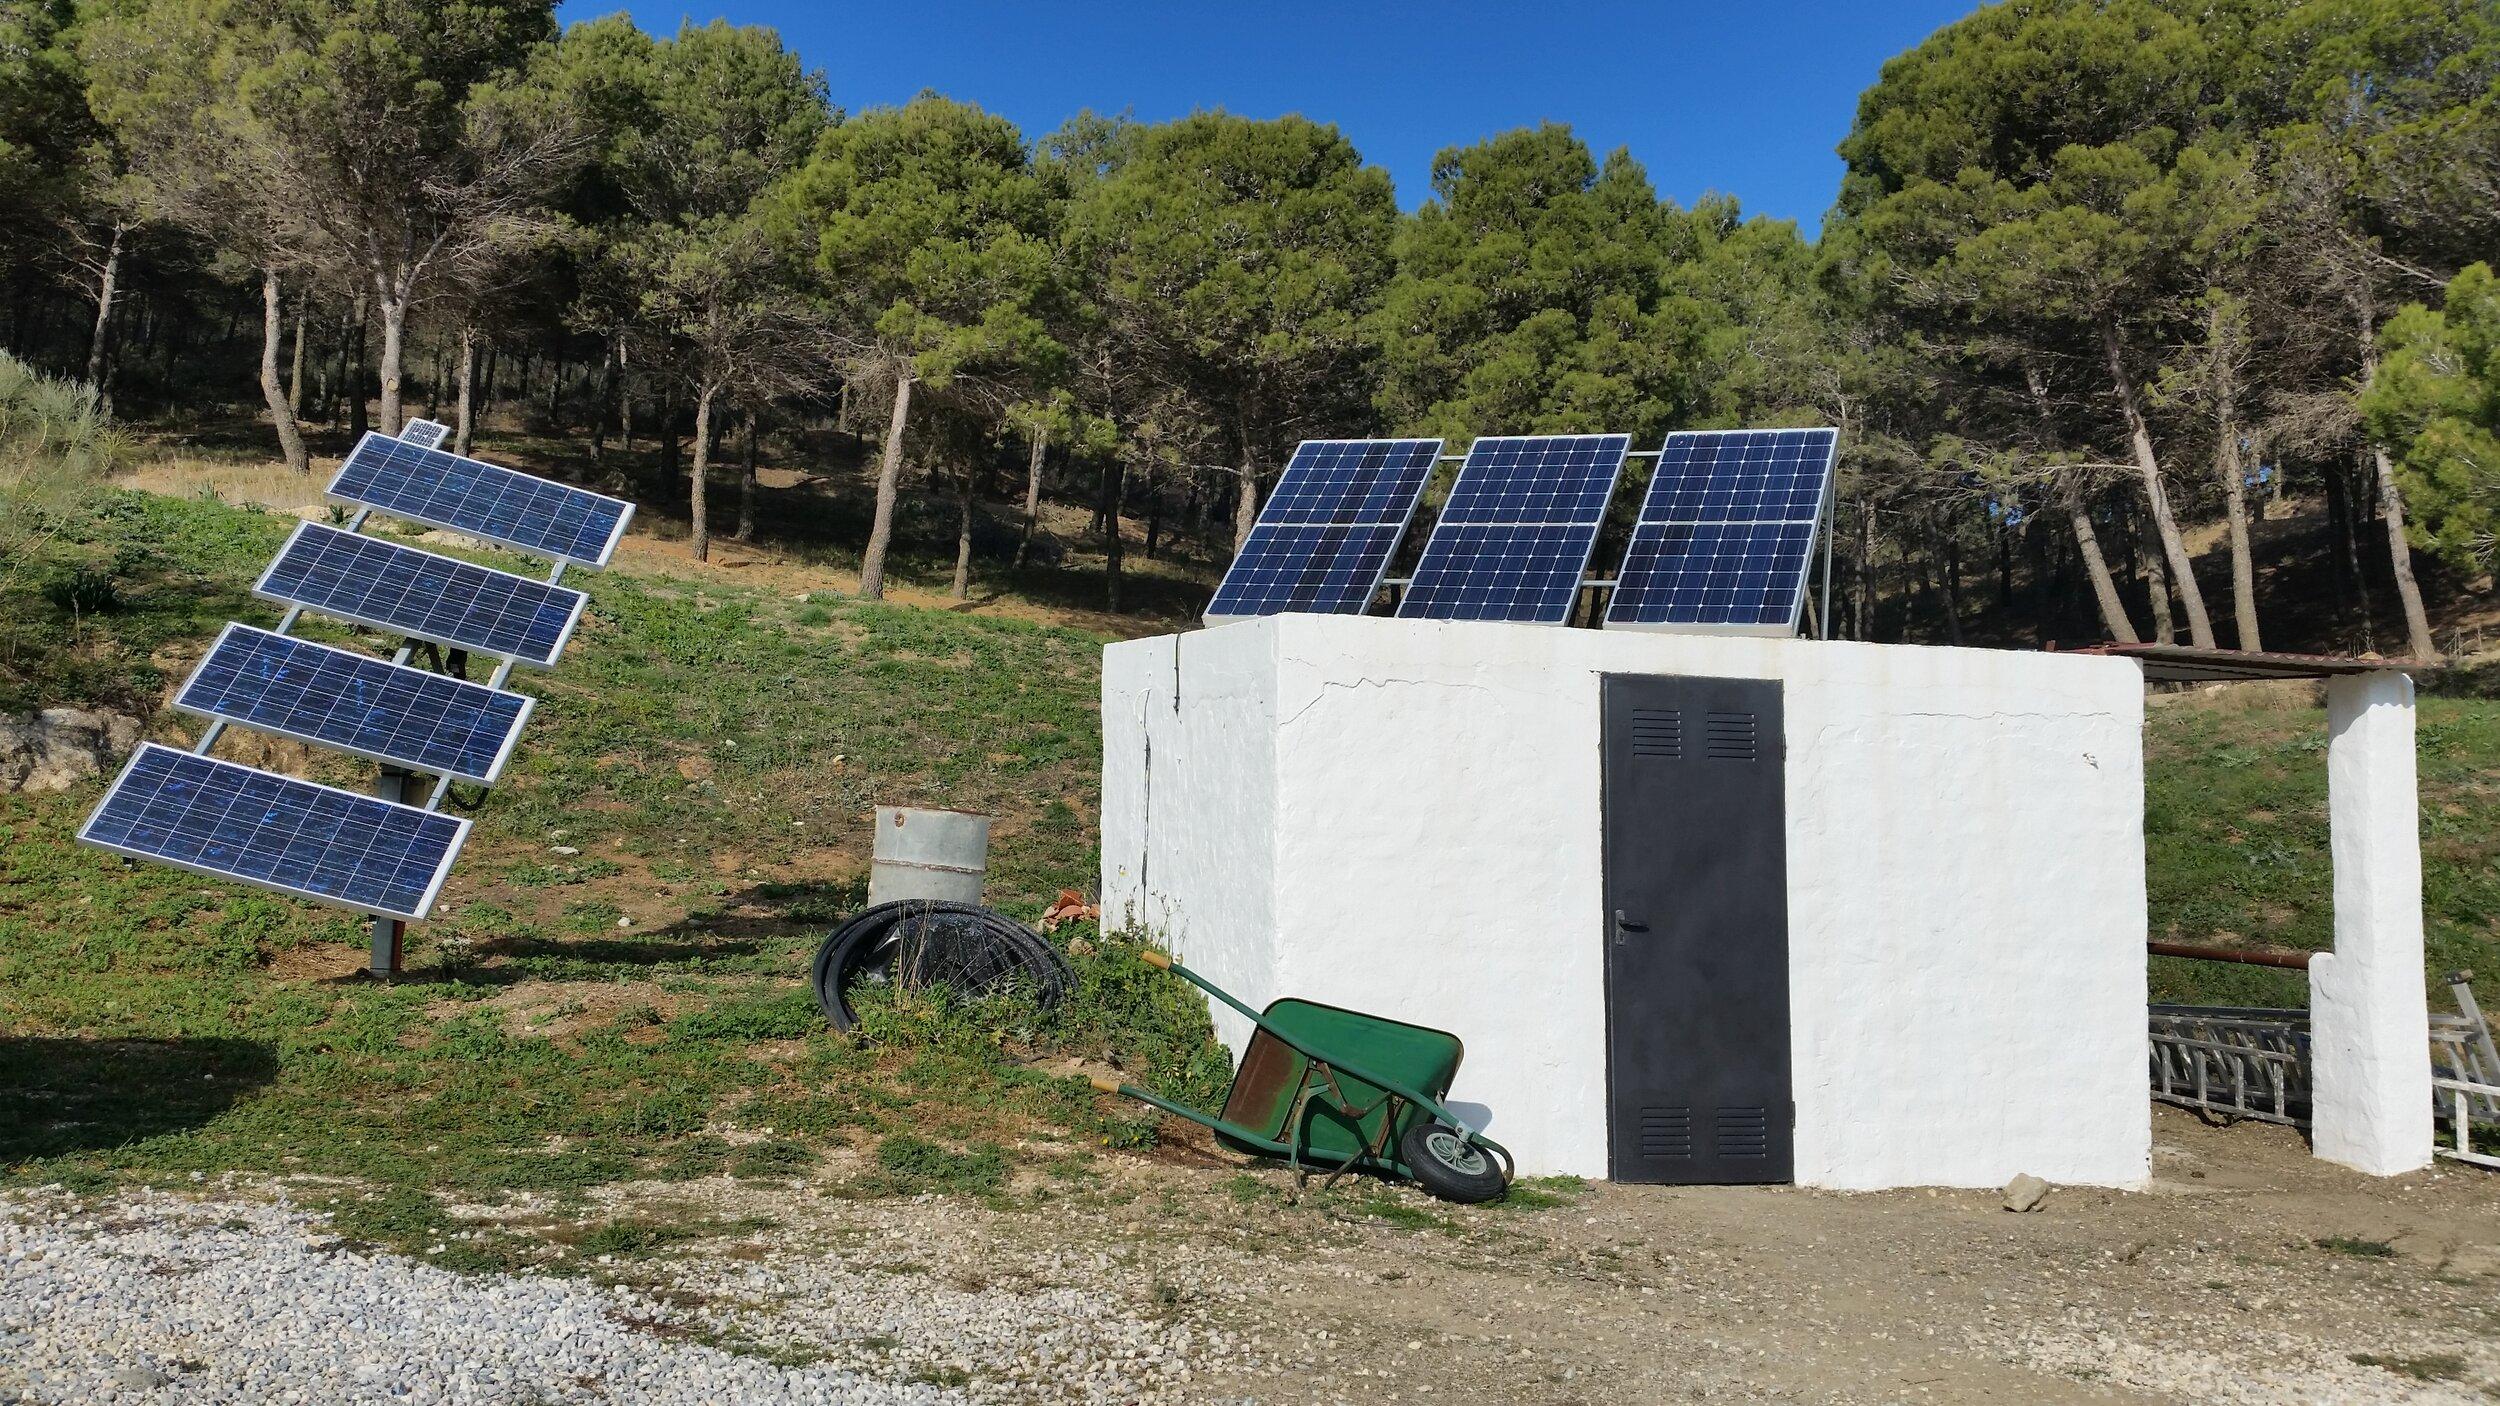 solar panels on day 1